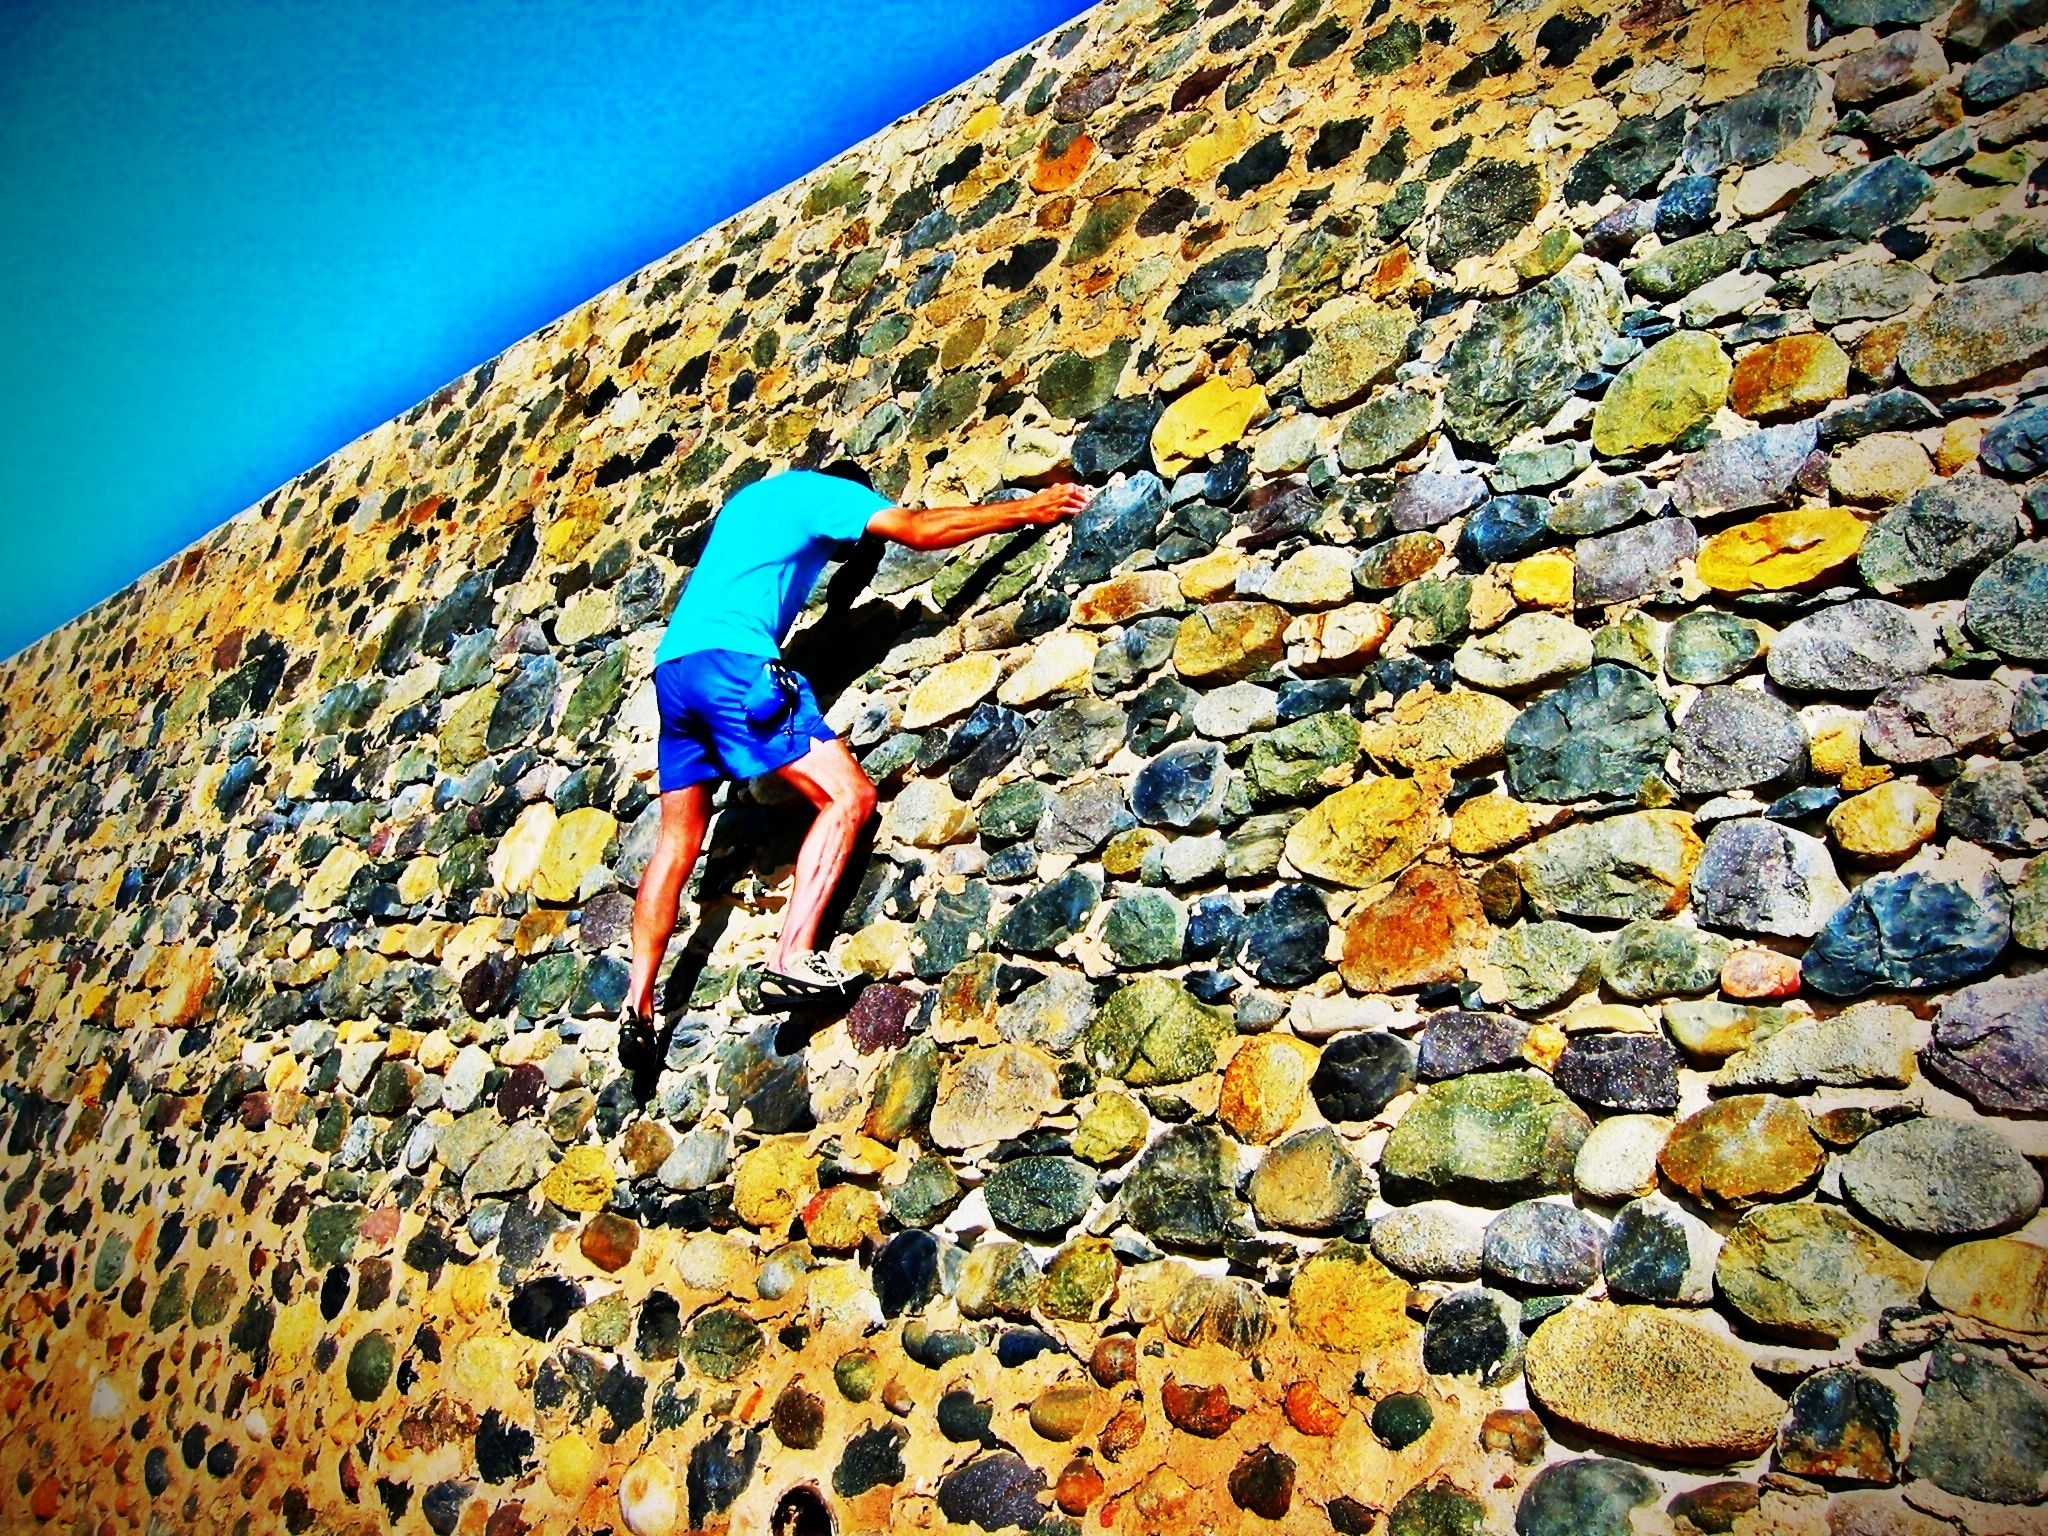 Bouldering in la jolla bouldering photography gallery